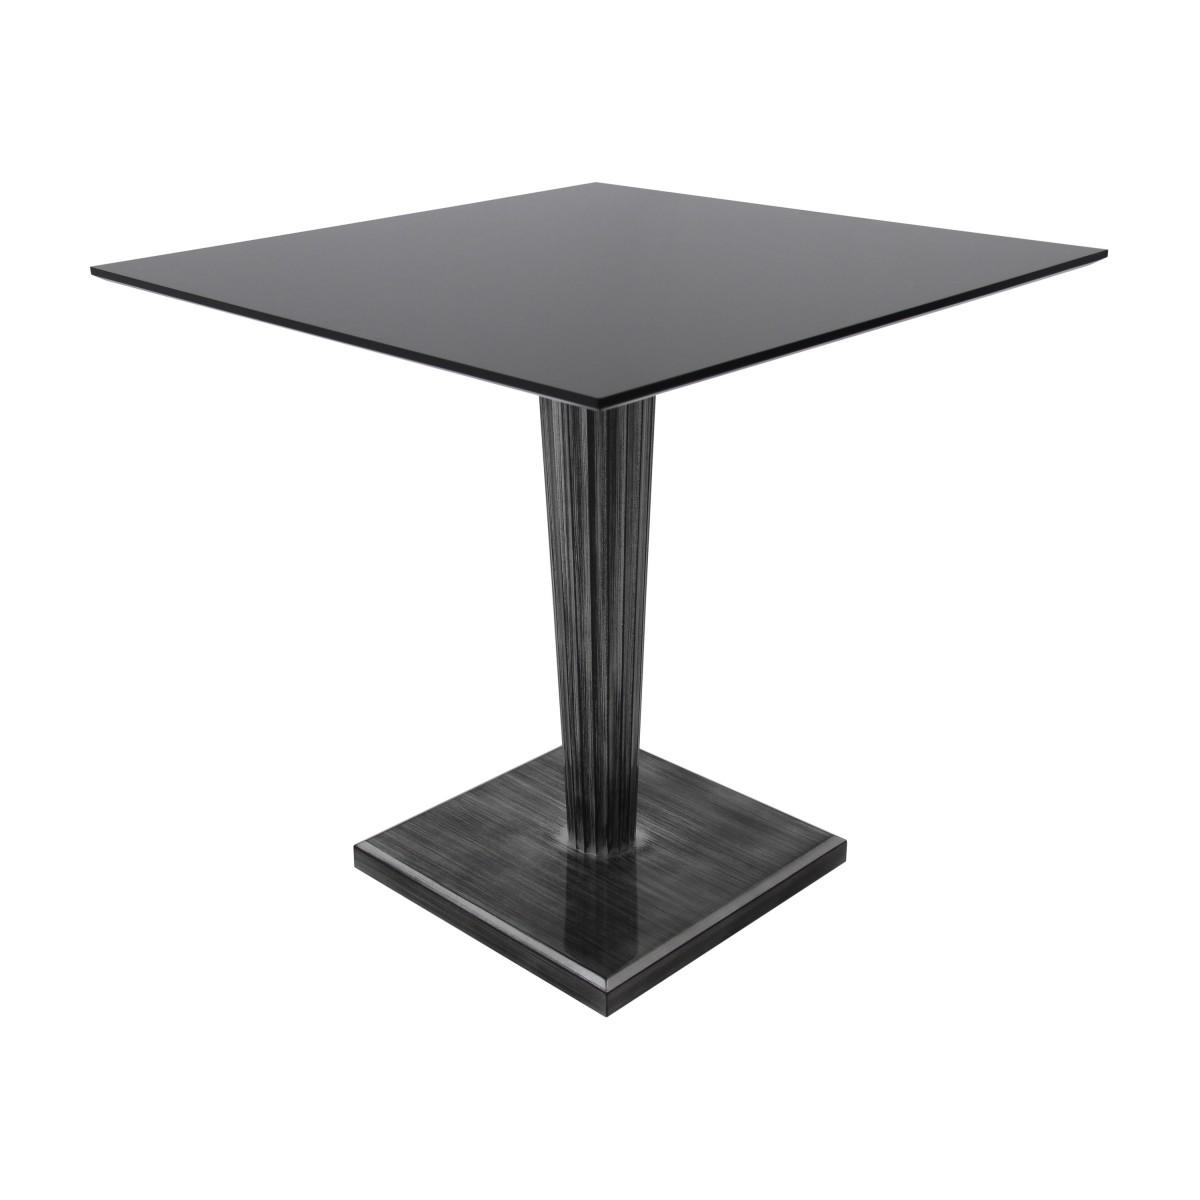 italian modern table atene 1 2980